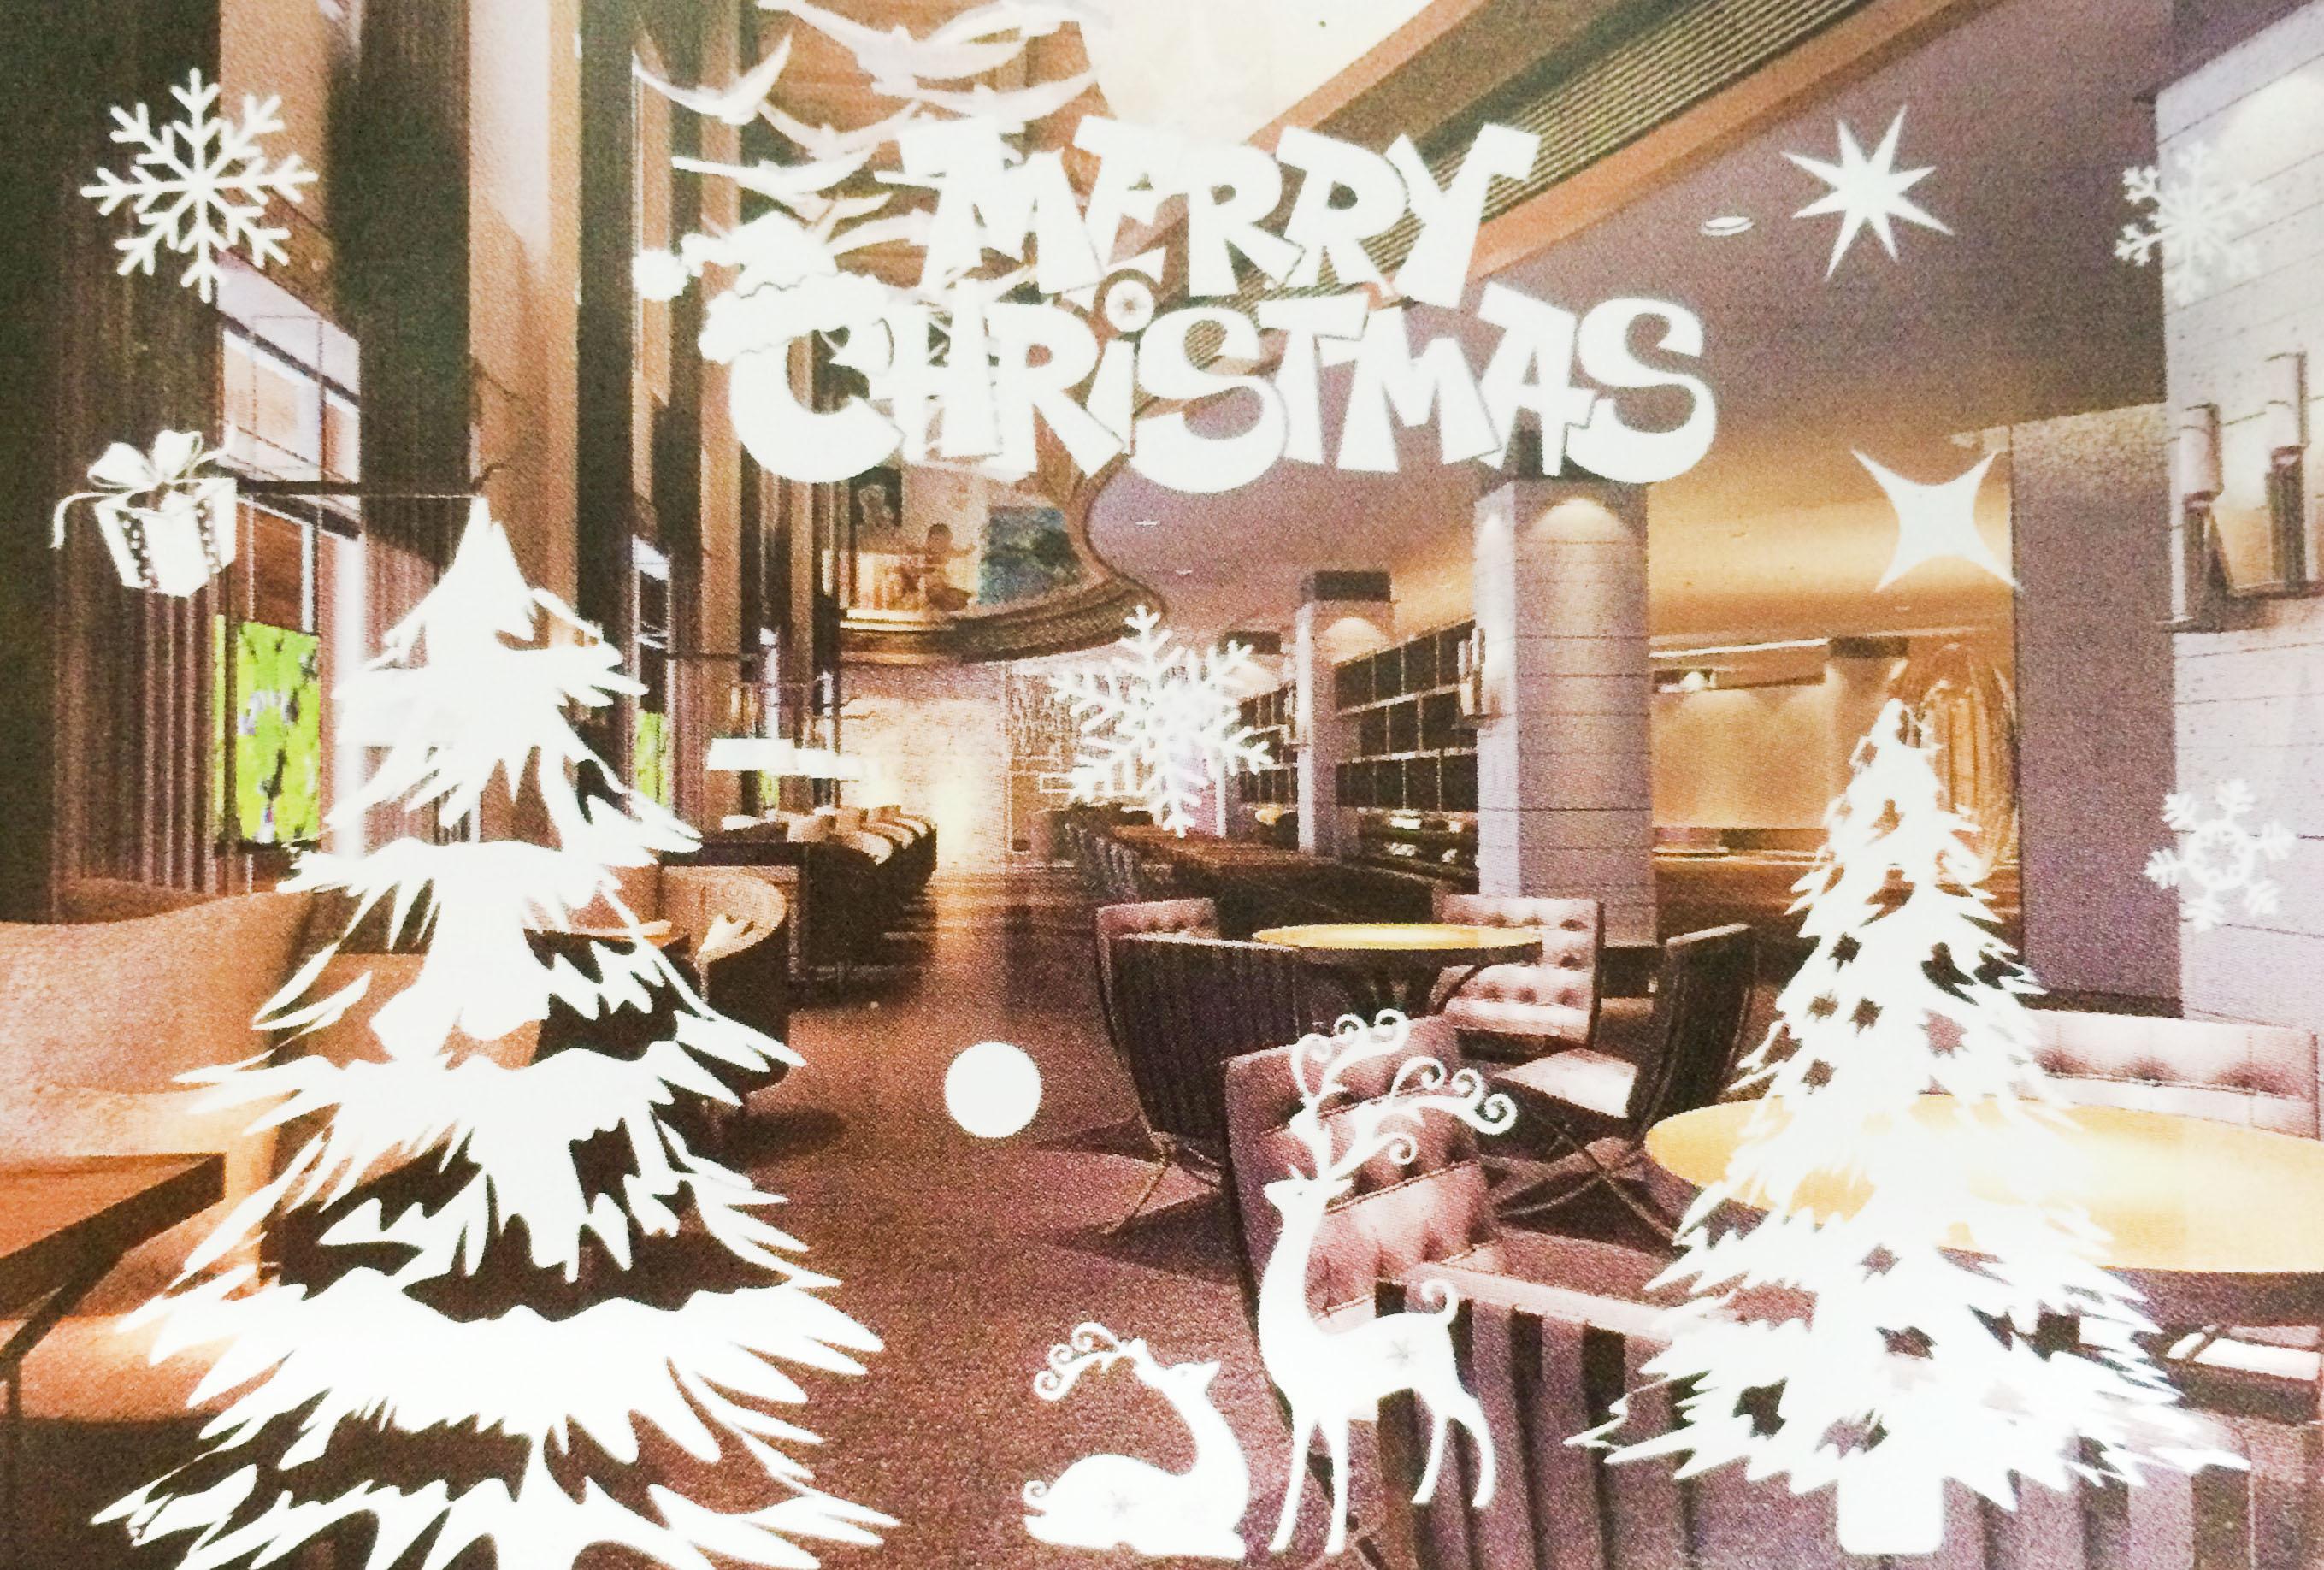 X射線【X150010】麋鹿聖誕樹(白色) 靜電窗貼,聖誕節/聖誕擺飾/聖誕佈置/聖誕造景/聖誕裝飾/玻璃貼/牆面佈置/壁貼